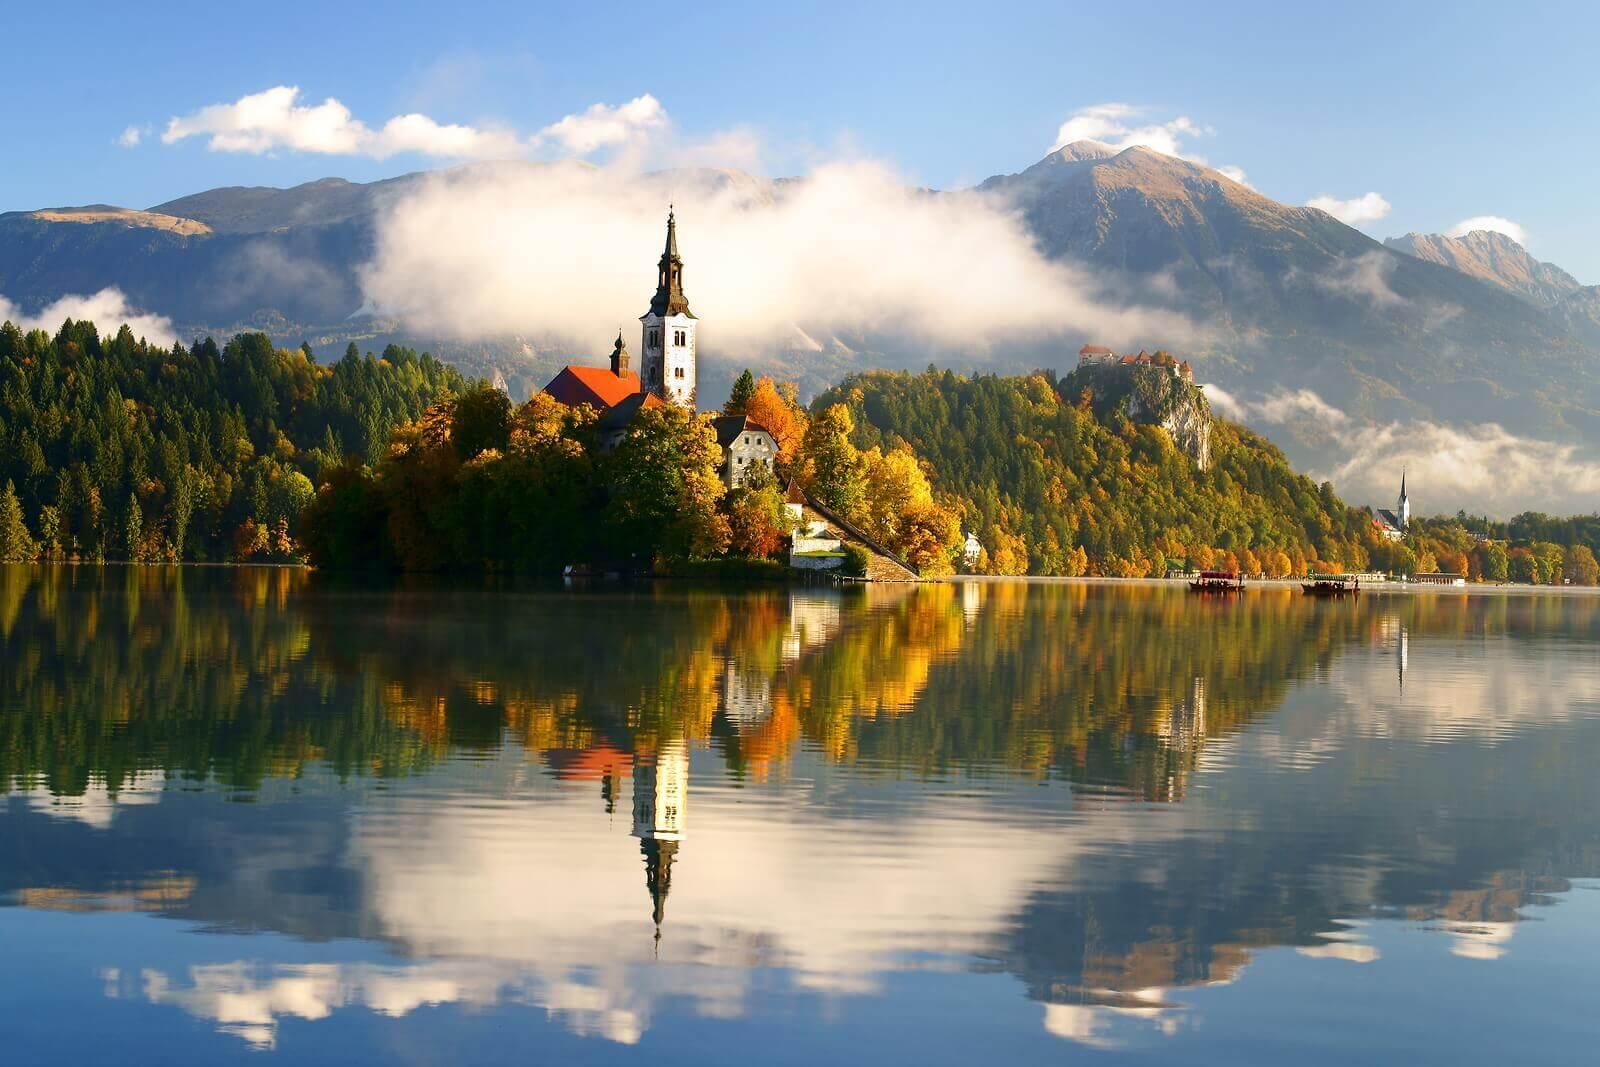 bled-Island-alpine-lake-resort